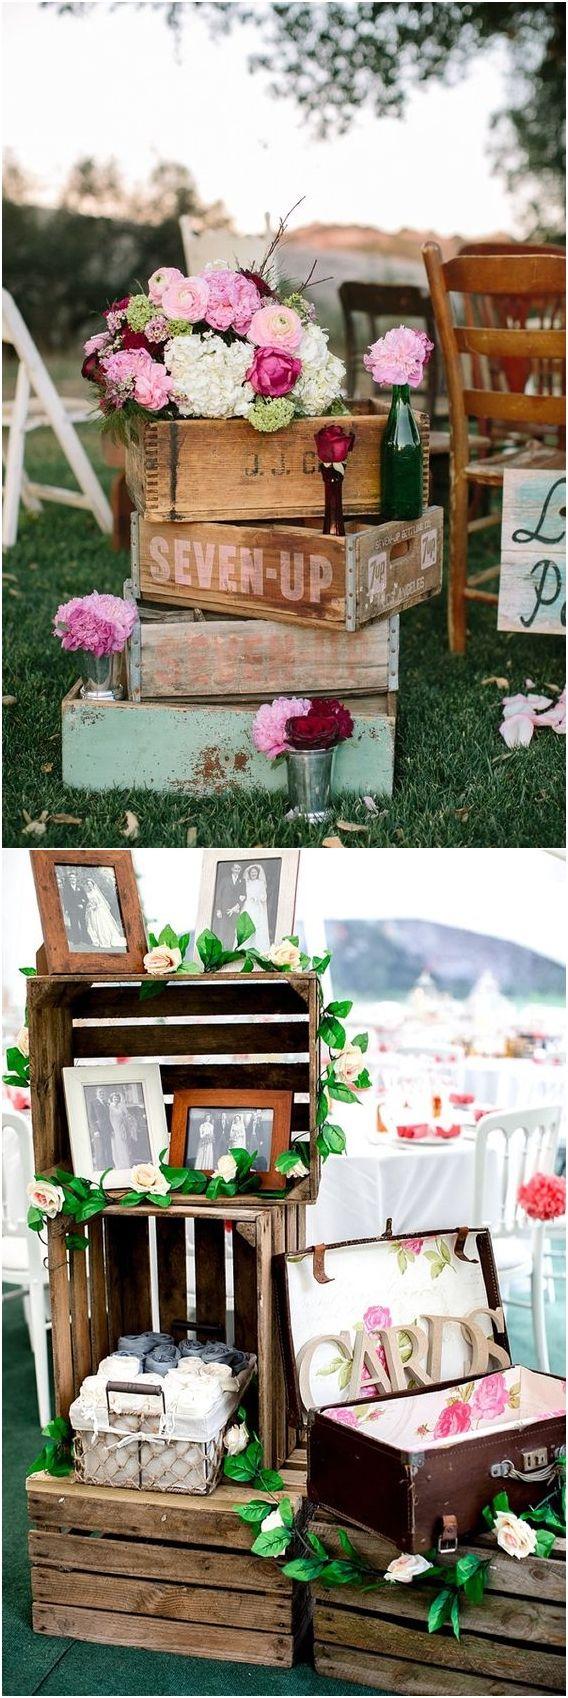 Latest wedding decorations 2018  Rustic Woodsy Wedding Trend  Wooden Crates  Woodsy wedding